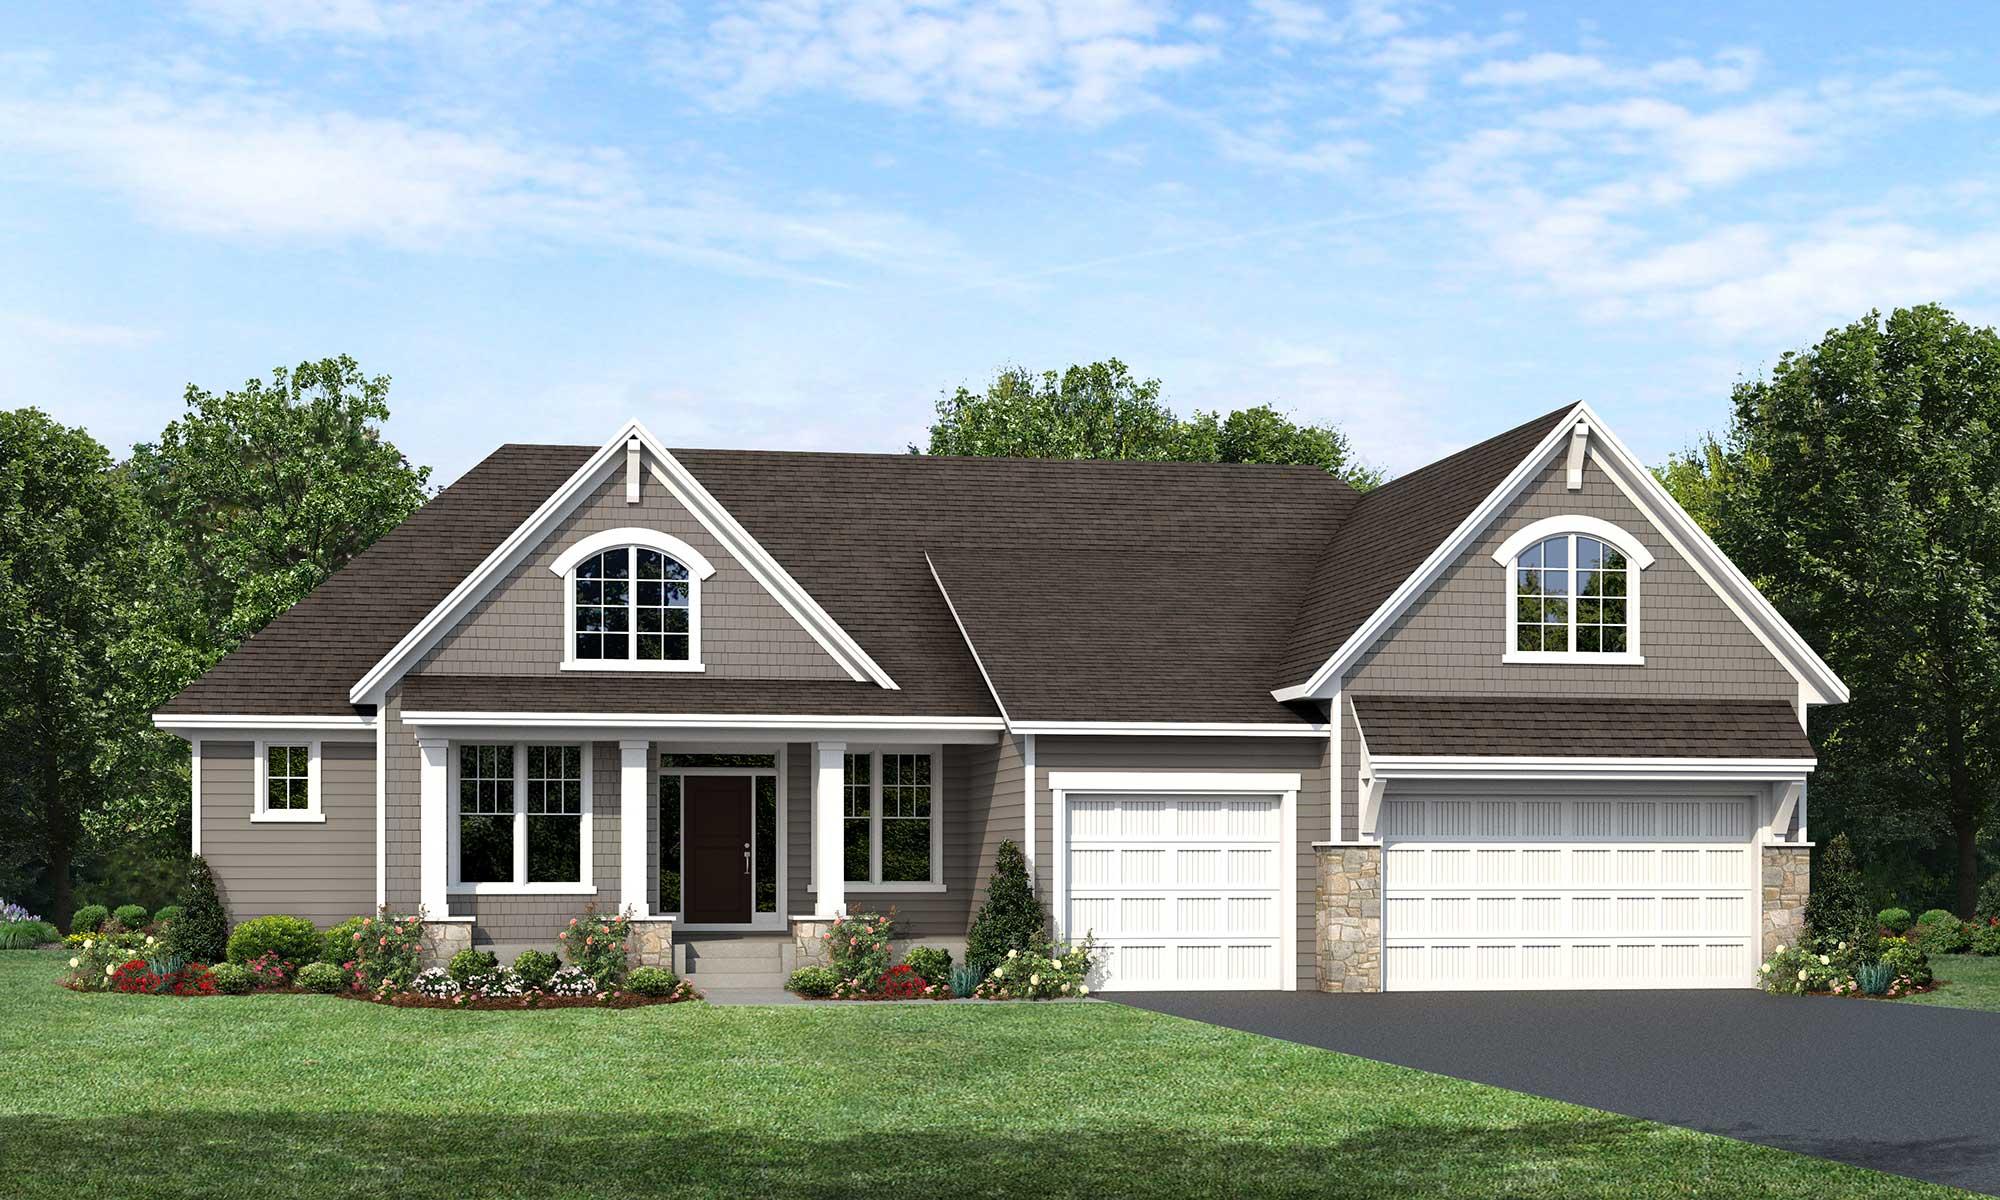 Mississippi home plan Elevation A rendering